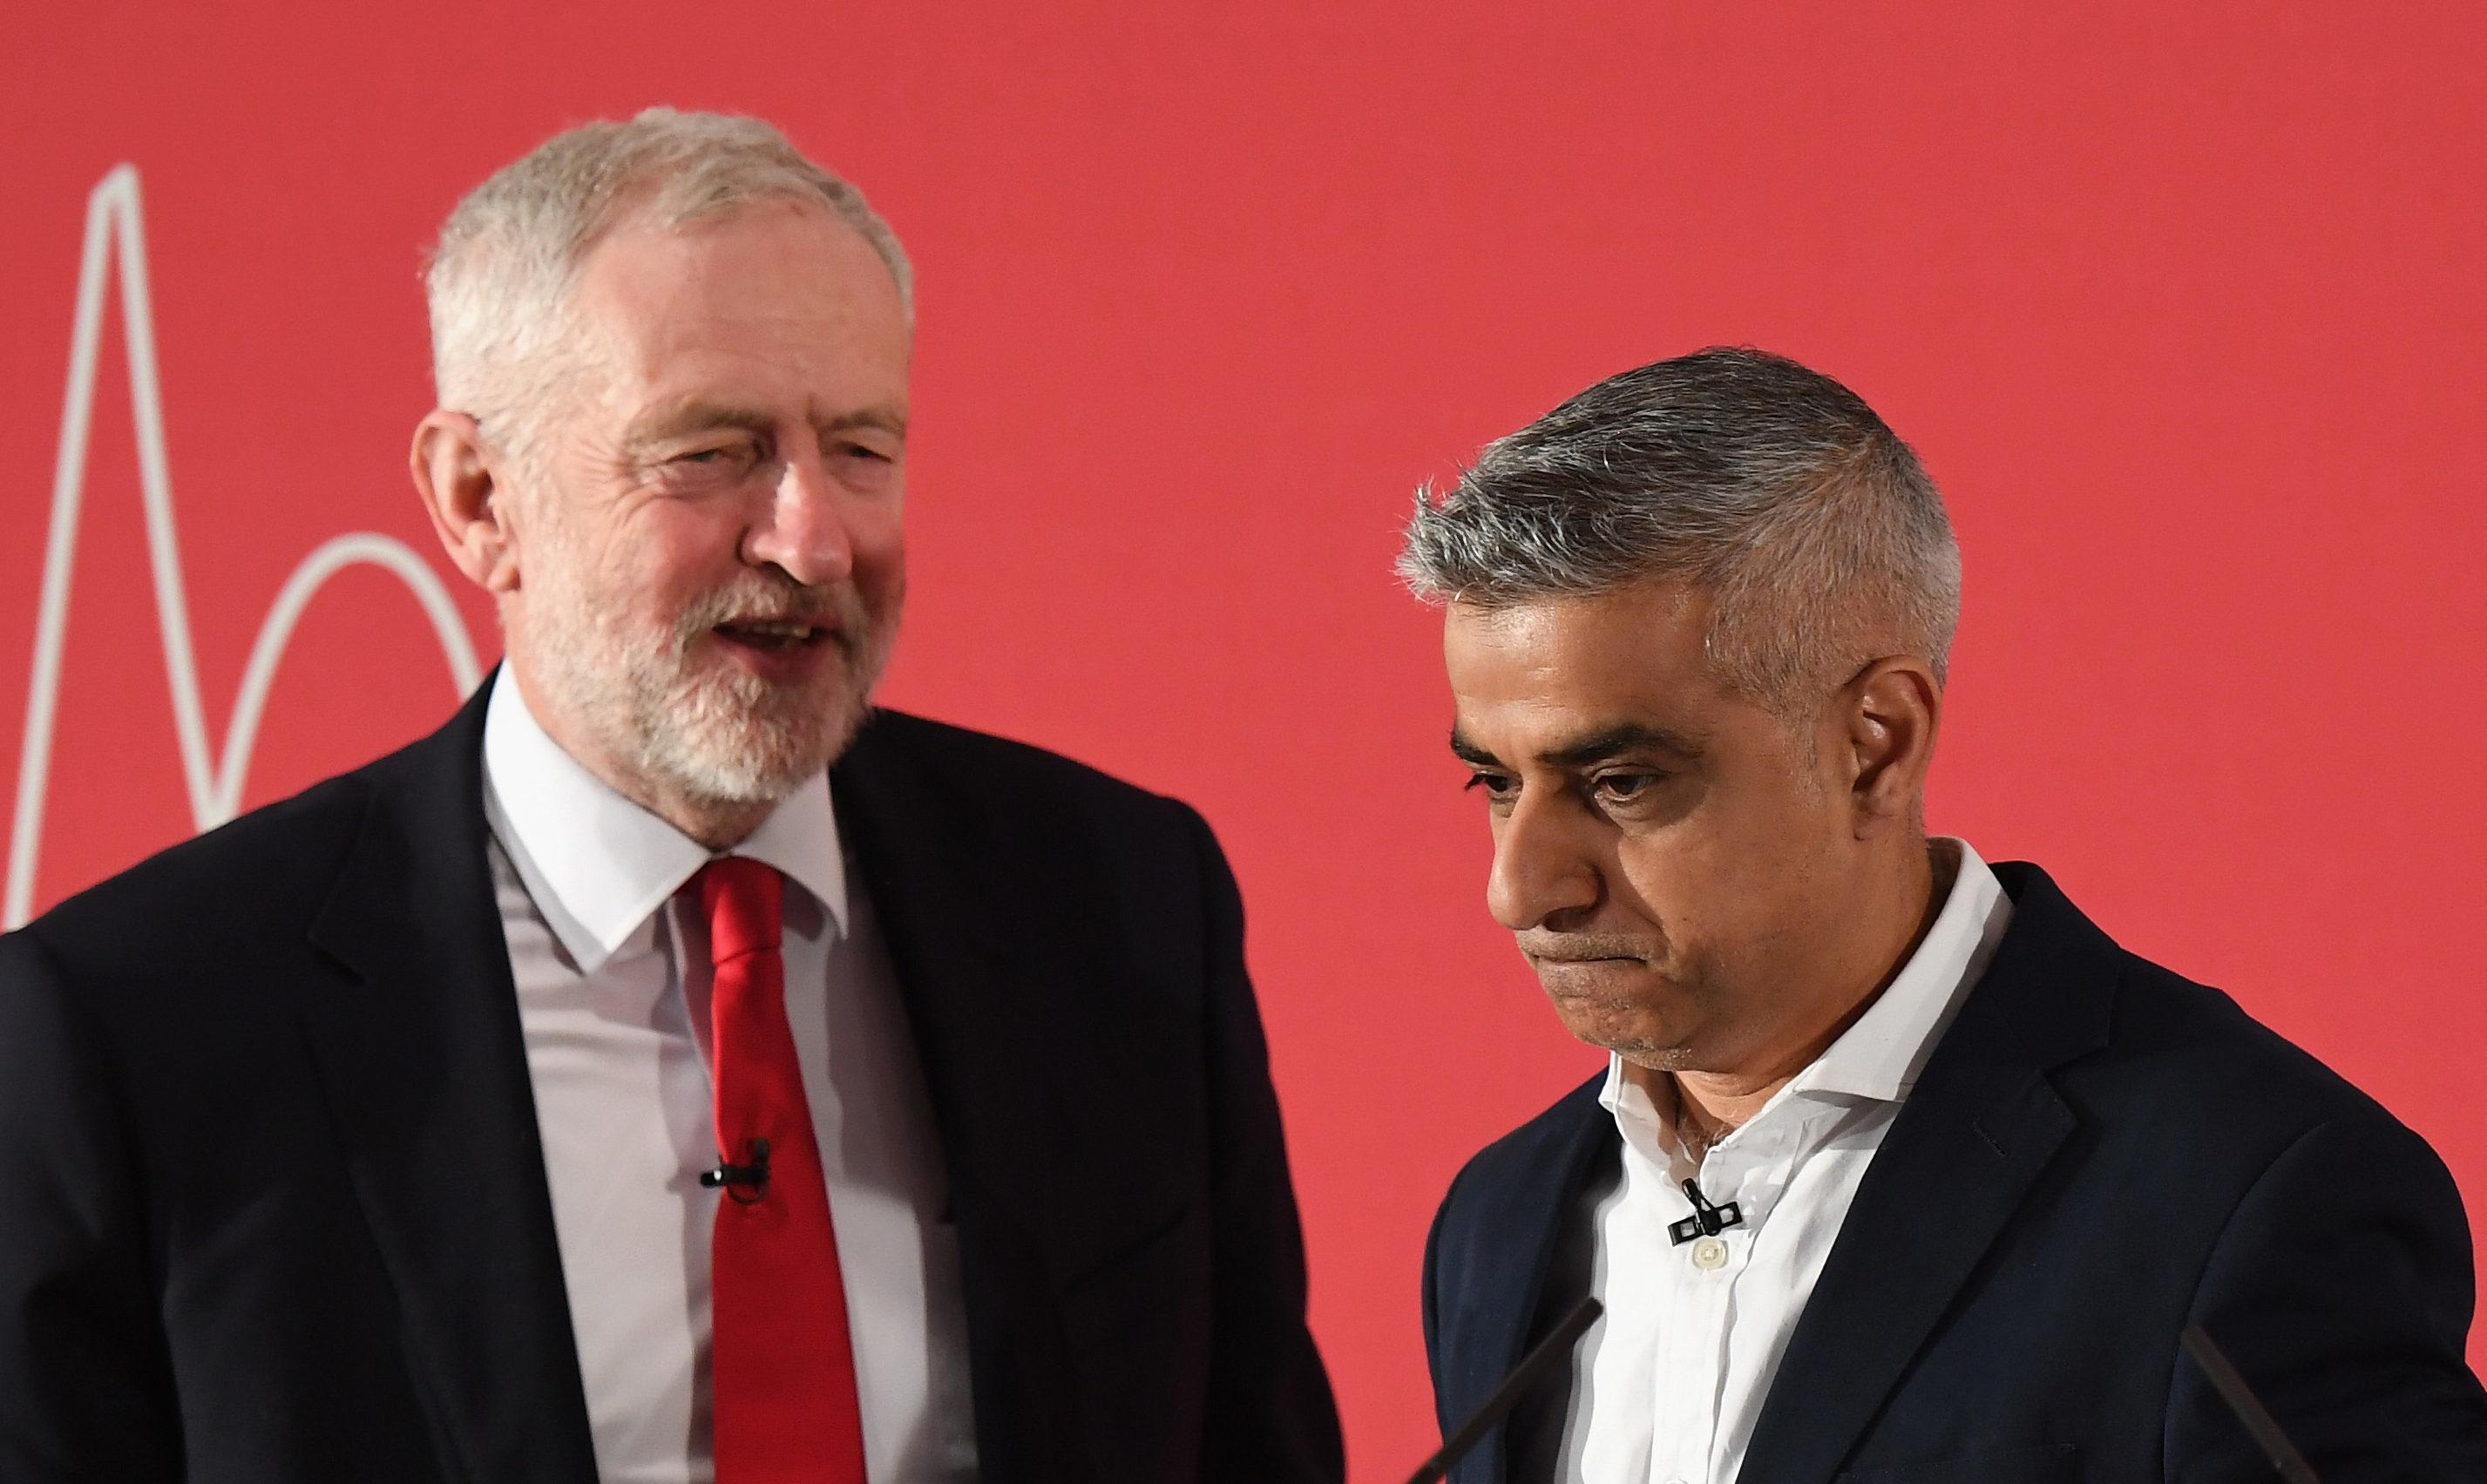 London Mayor Sadiq Khan and Labour Leader Jeremy Corbyn (Chris J Ratcliffe/Getty Images)